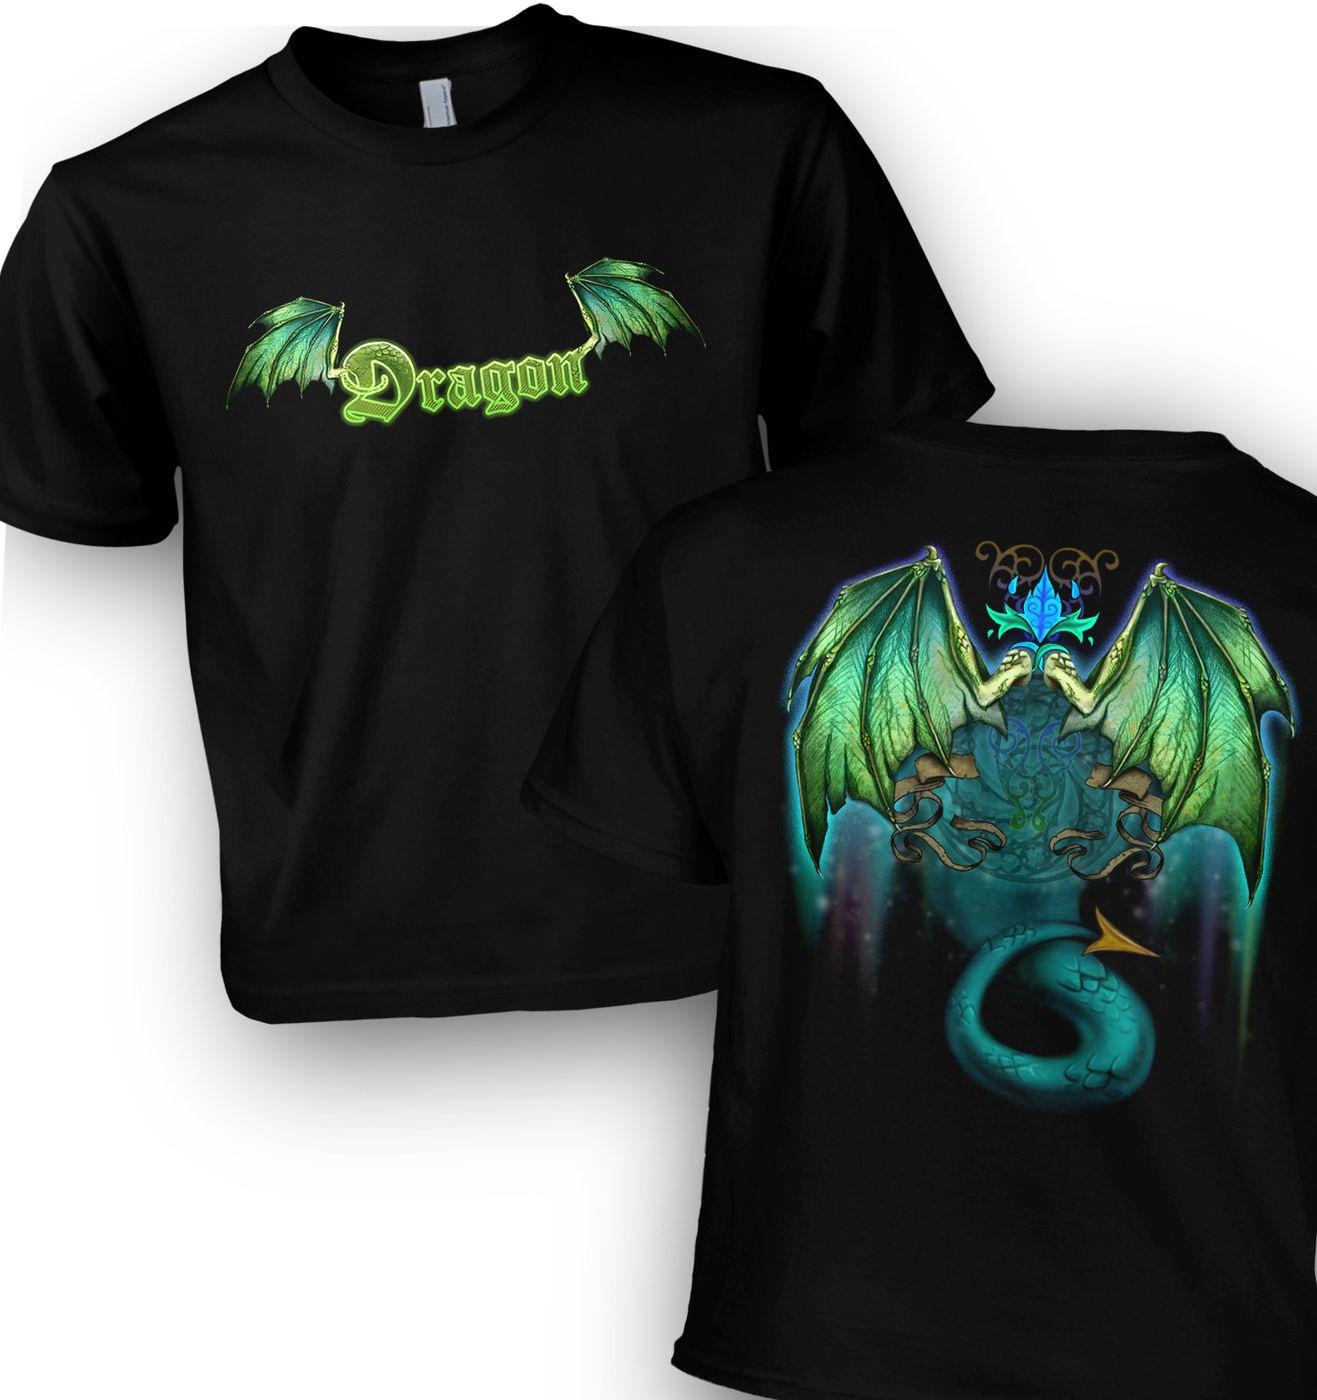 Green Dragon kids' t-shirt with stunning dragon wings backprint